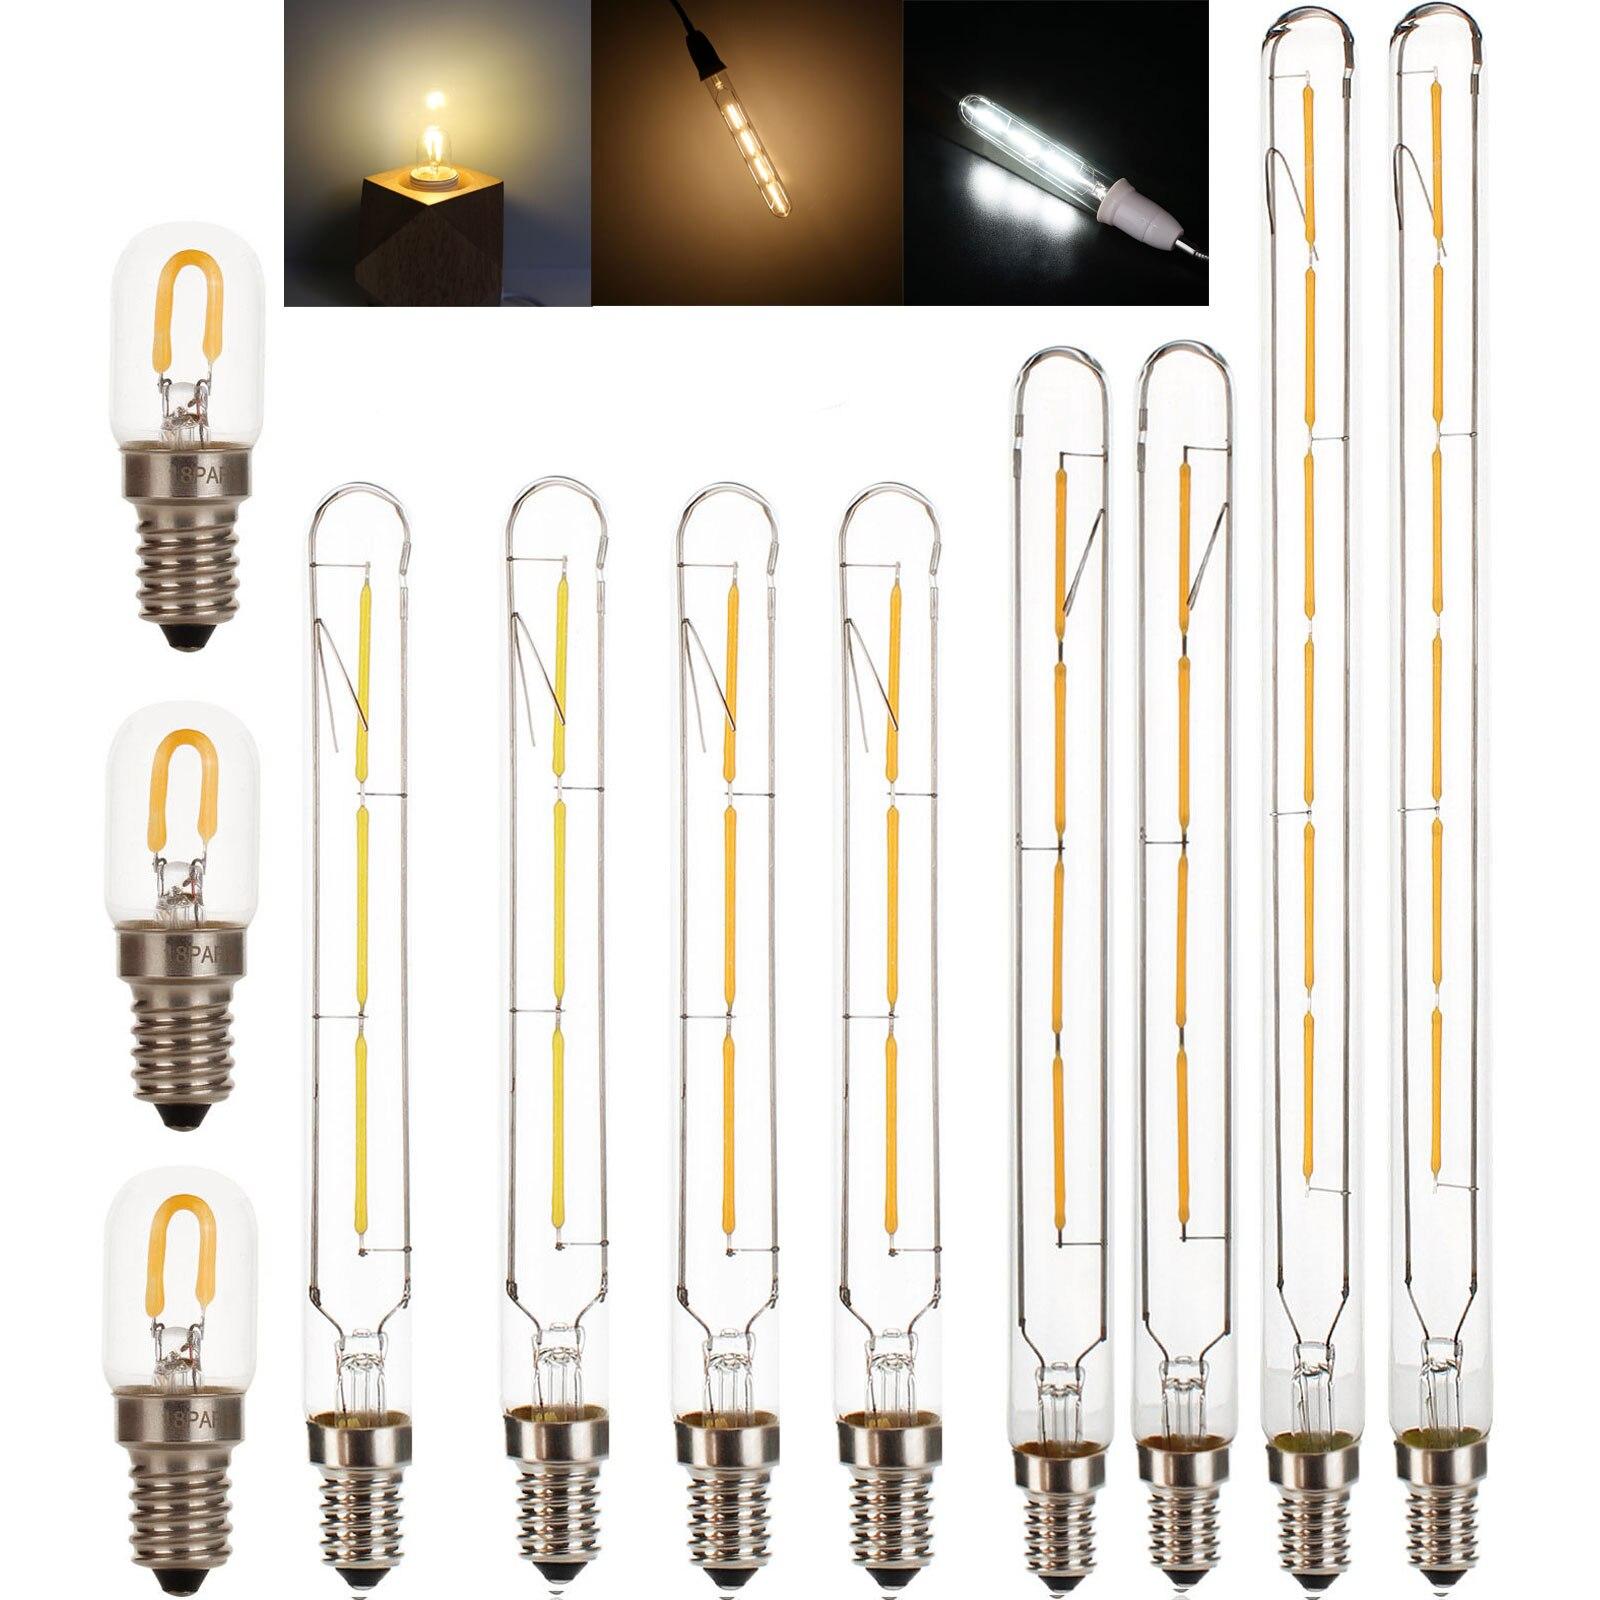 T20 E14 lámpara led retro edison Luz de filamento 220v 240v 230v bombilla incandescente de la lámpara LED de novedad luces de decoración del hogar 2700K cálido